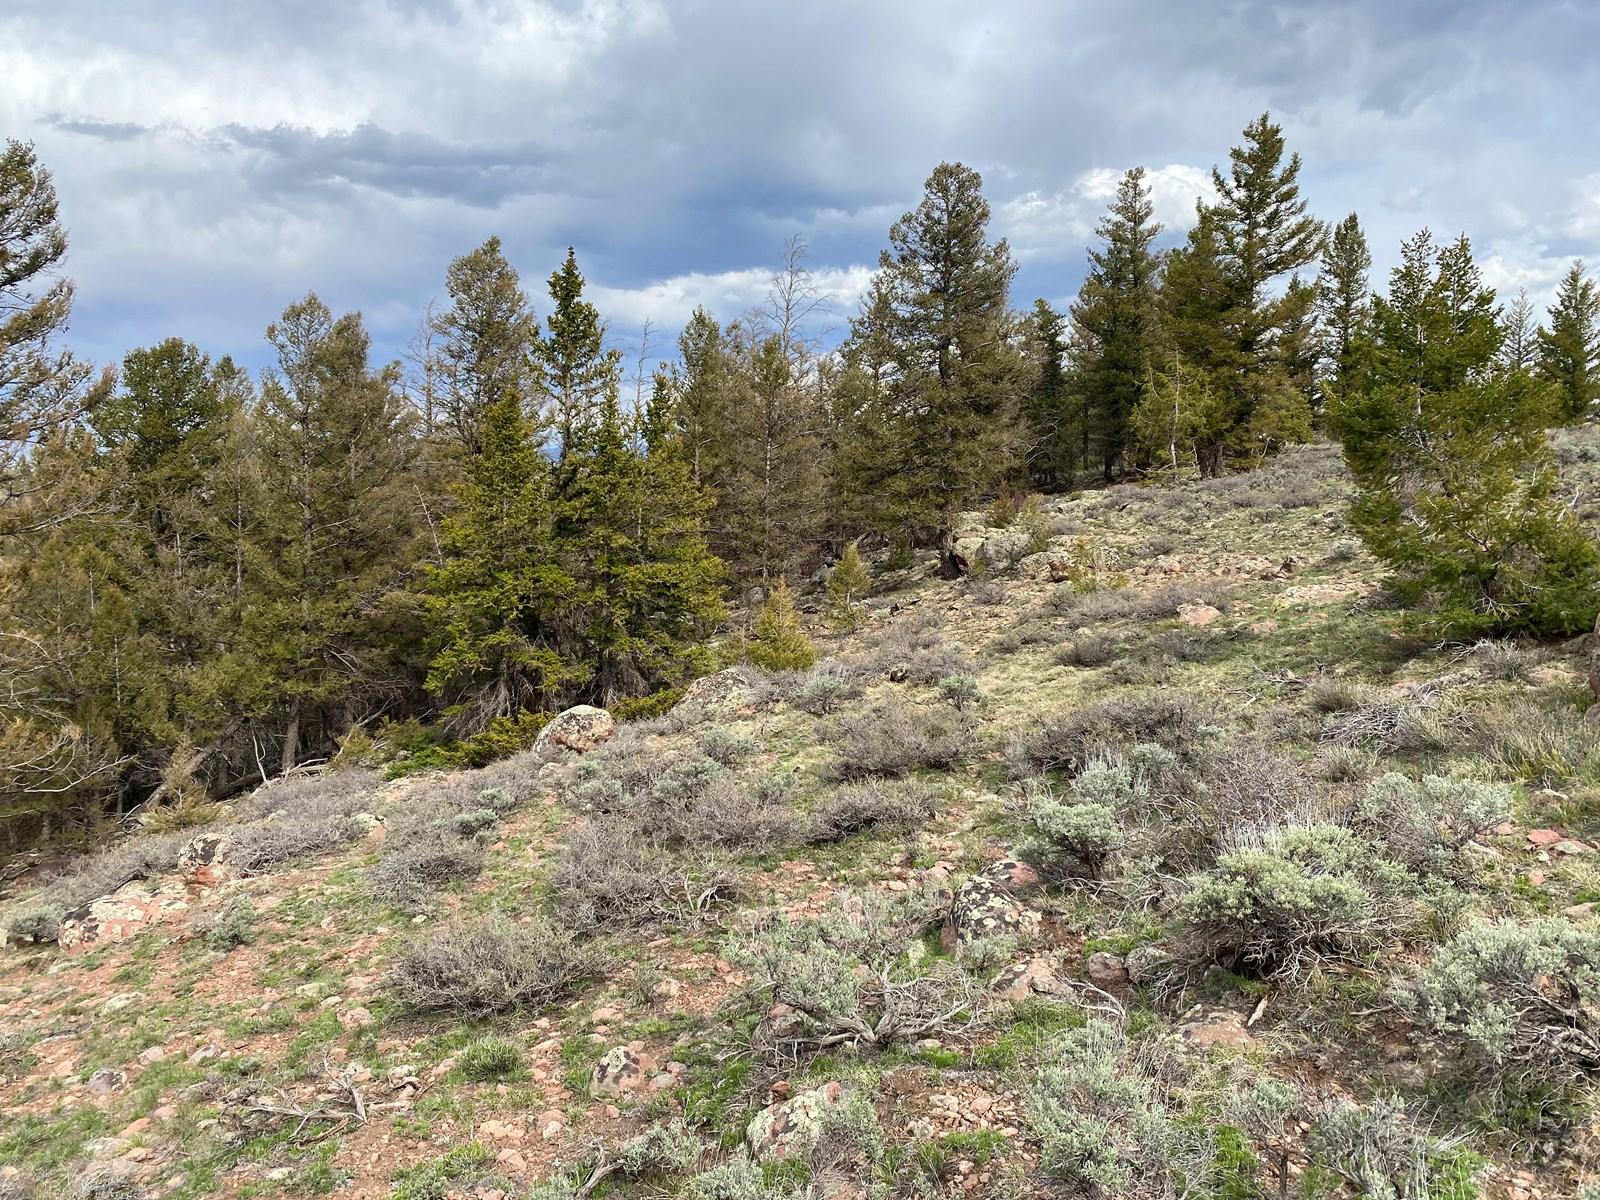 Colorado mountain land for summer retreat, RV parking